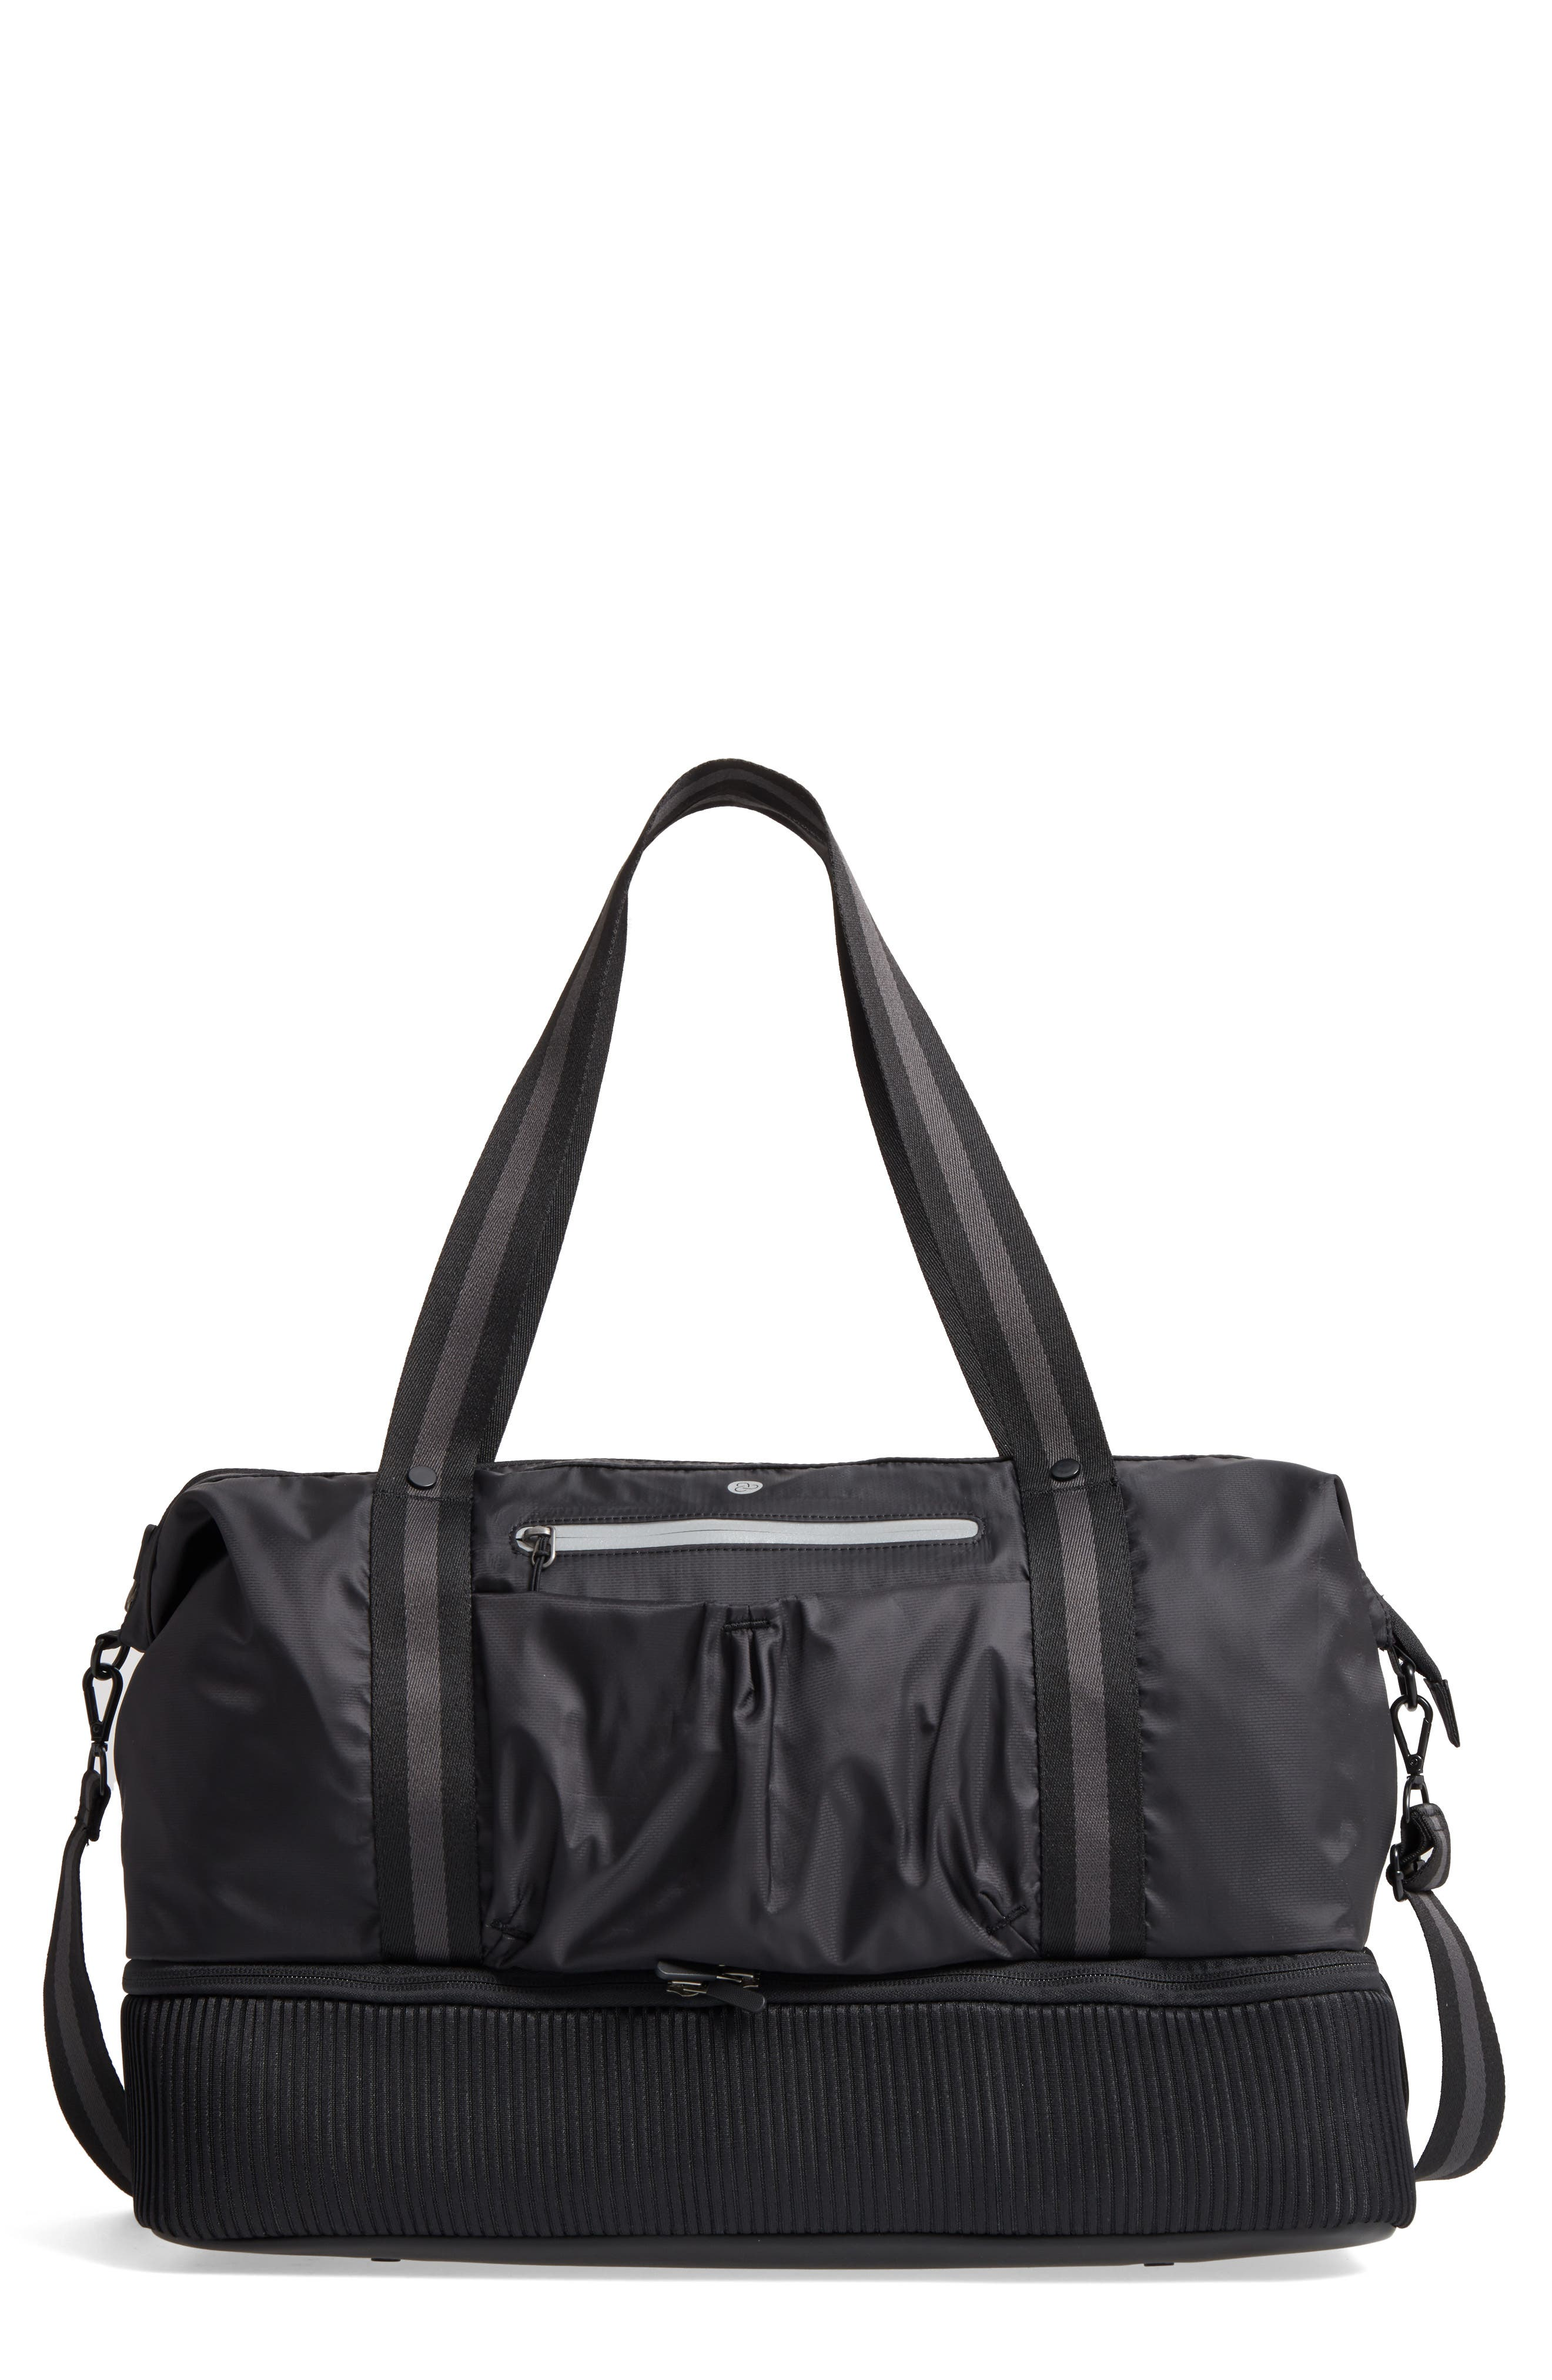 Alcove Duffel Bag,                         Main,                         color, 001